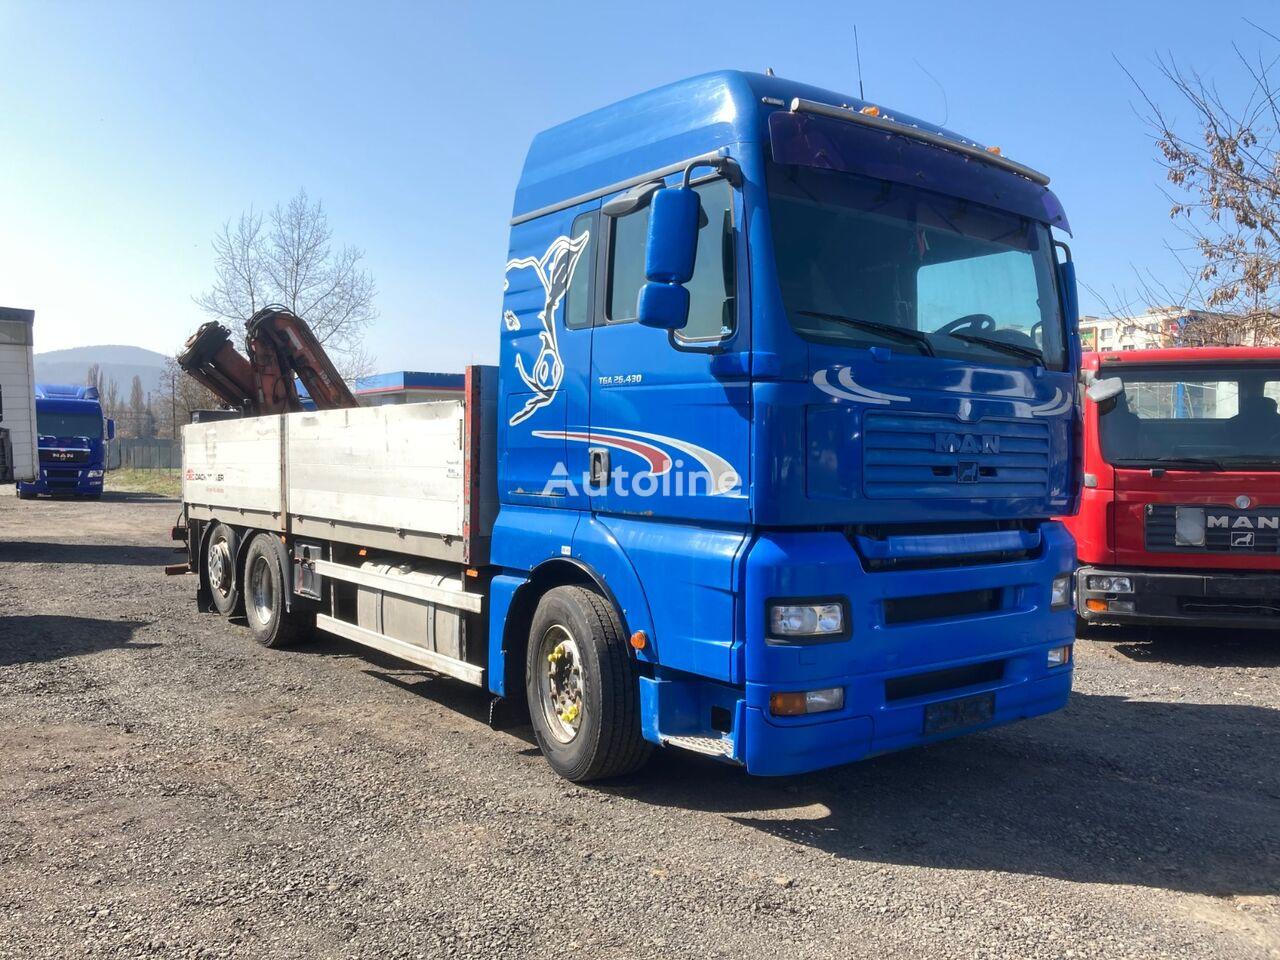 MAN TGA 26.430 flatbed truck